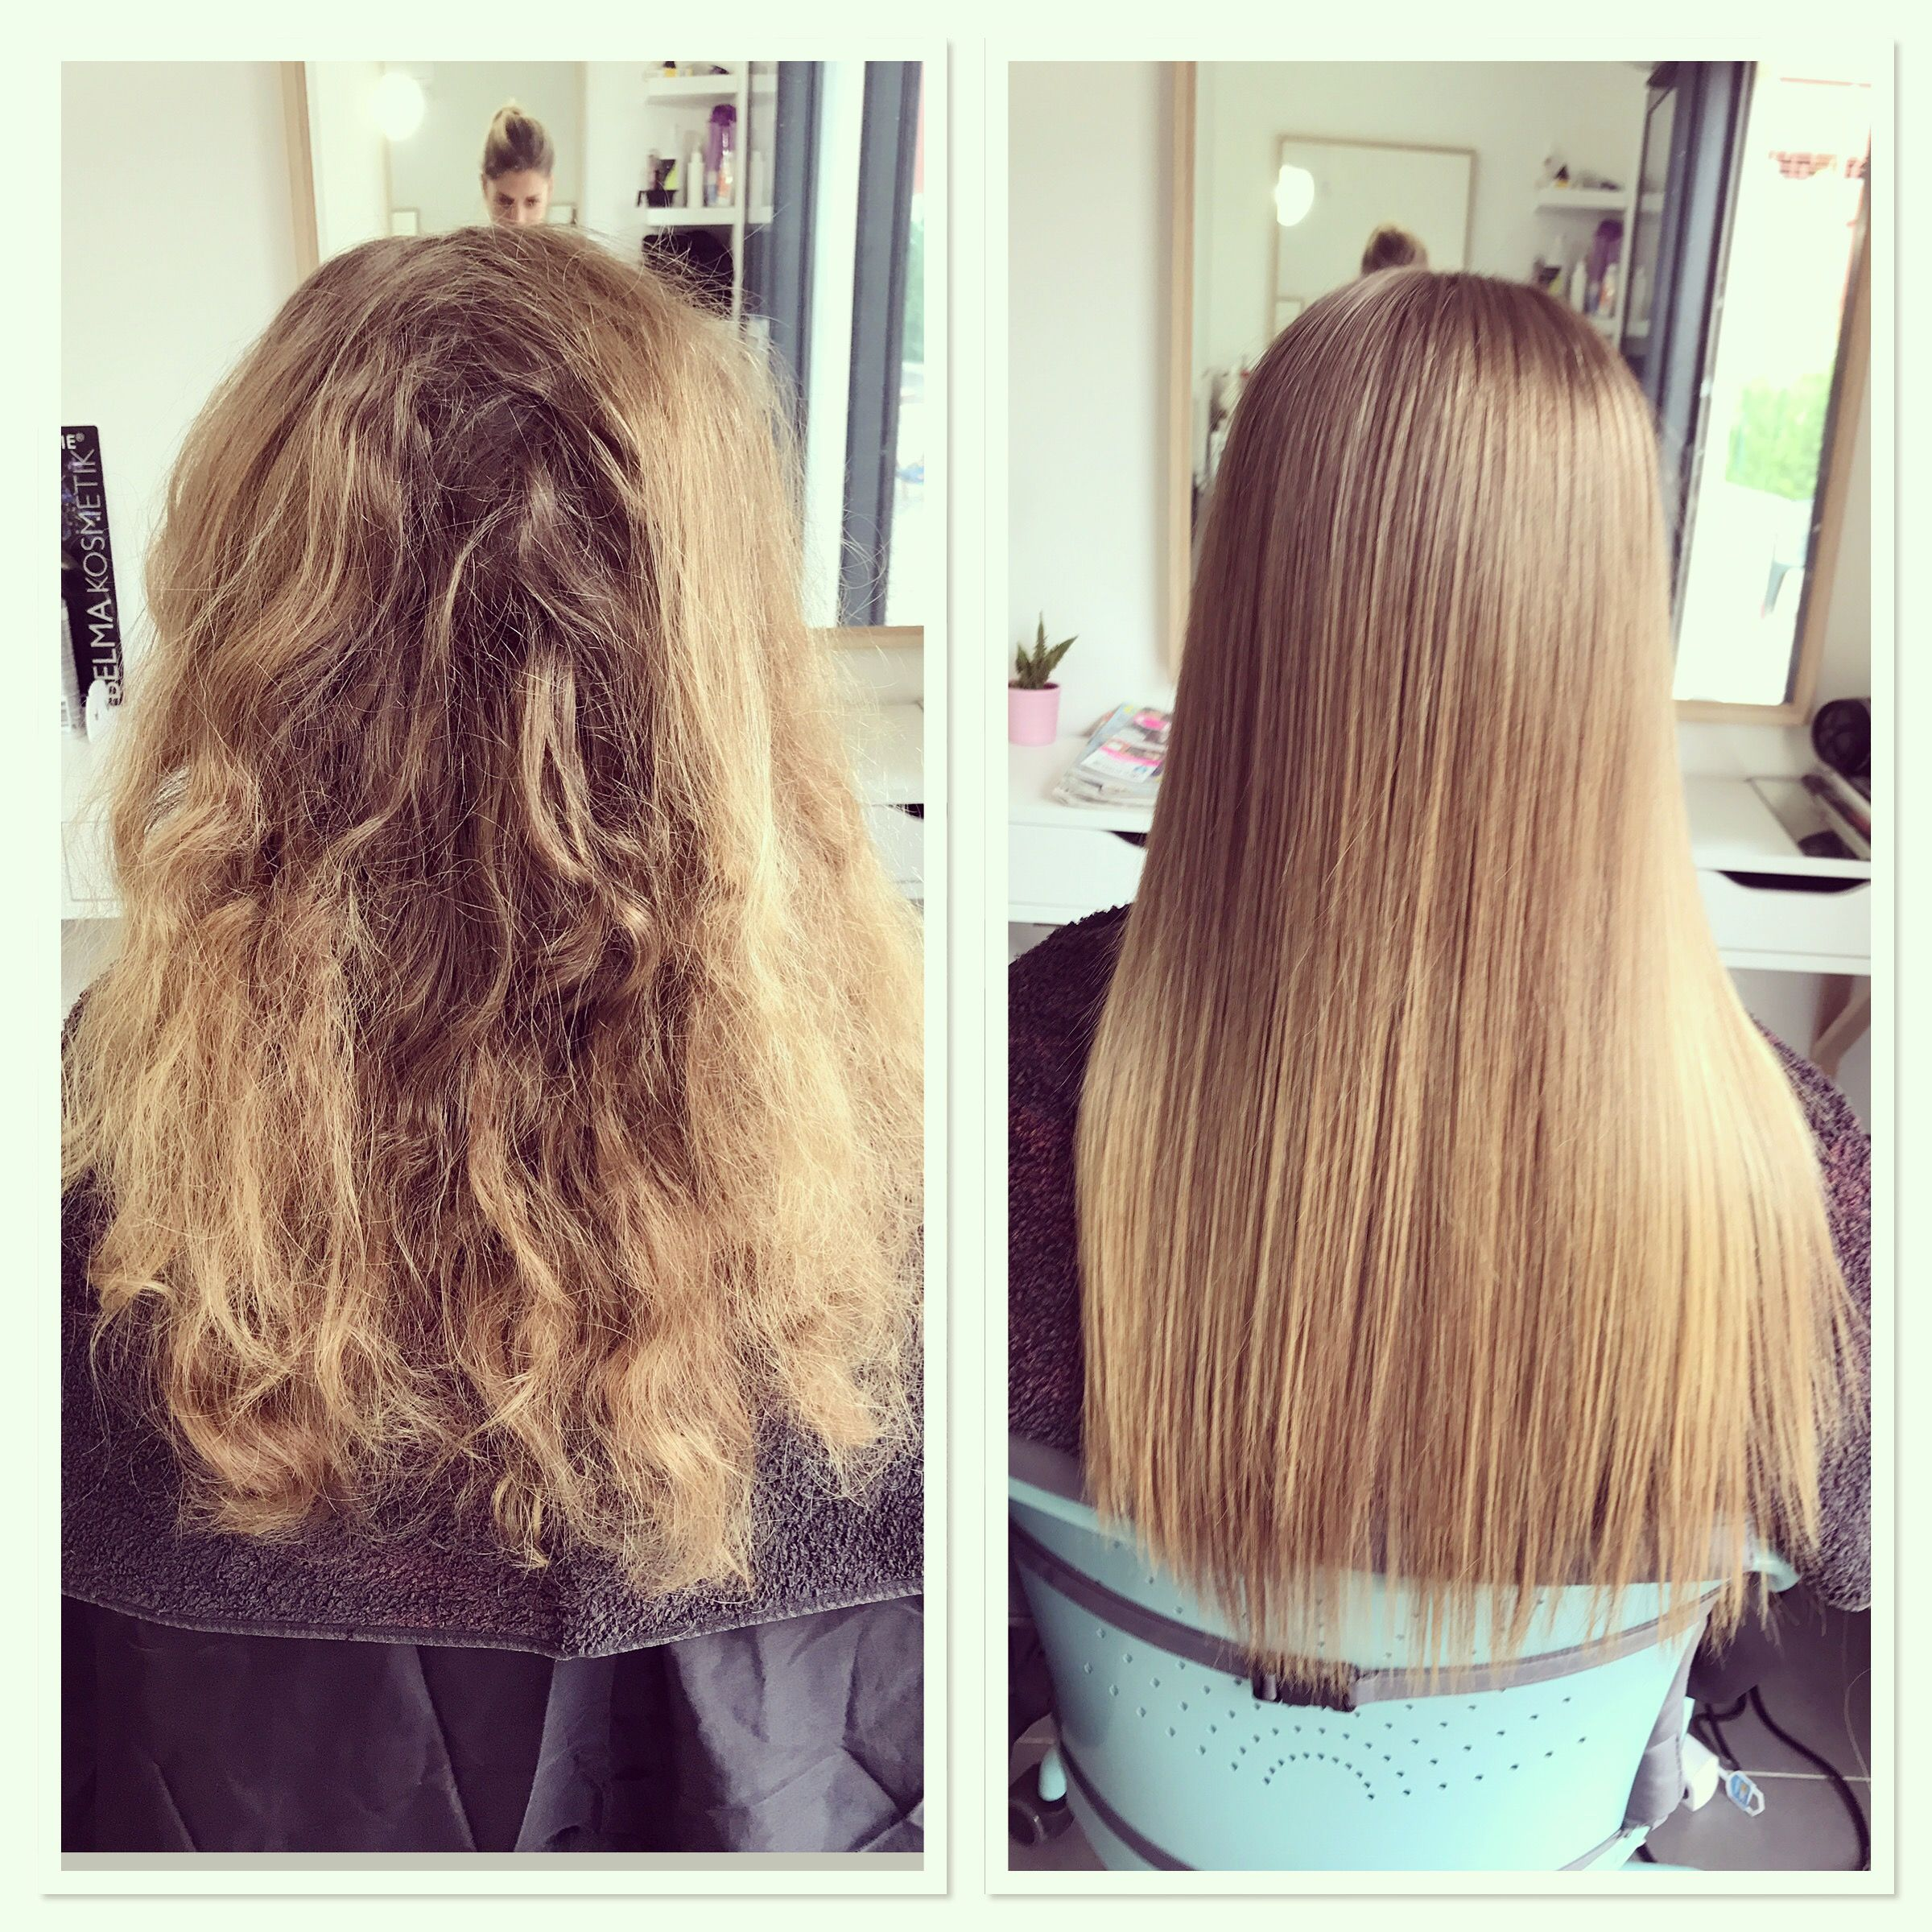 Teinture cheveux keratine